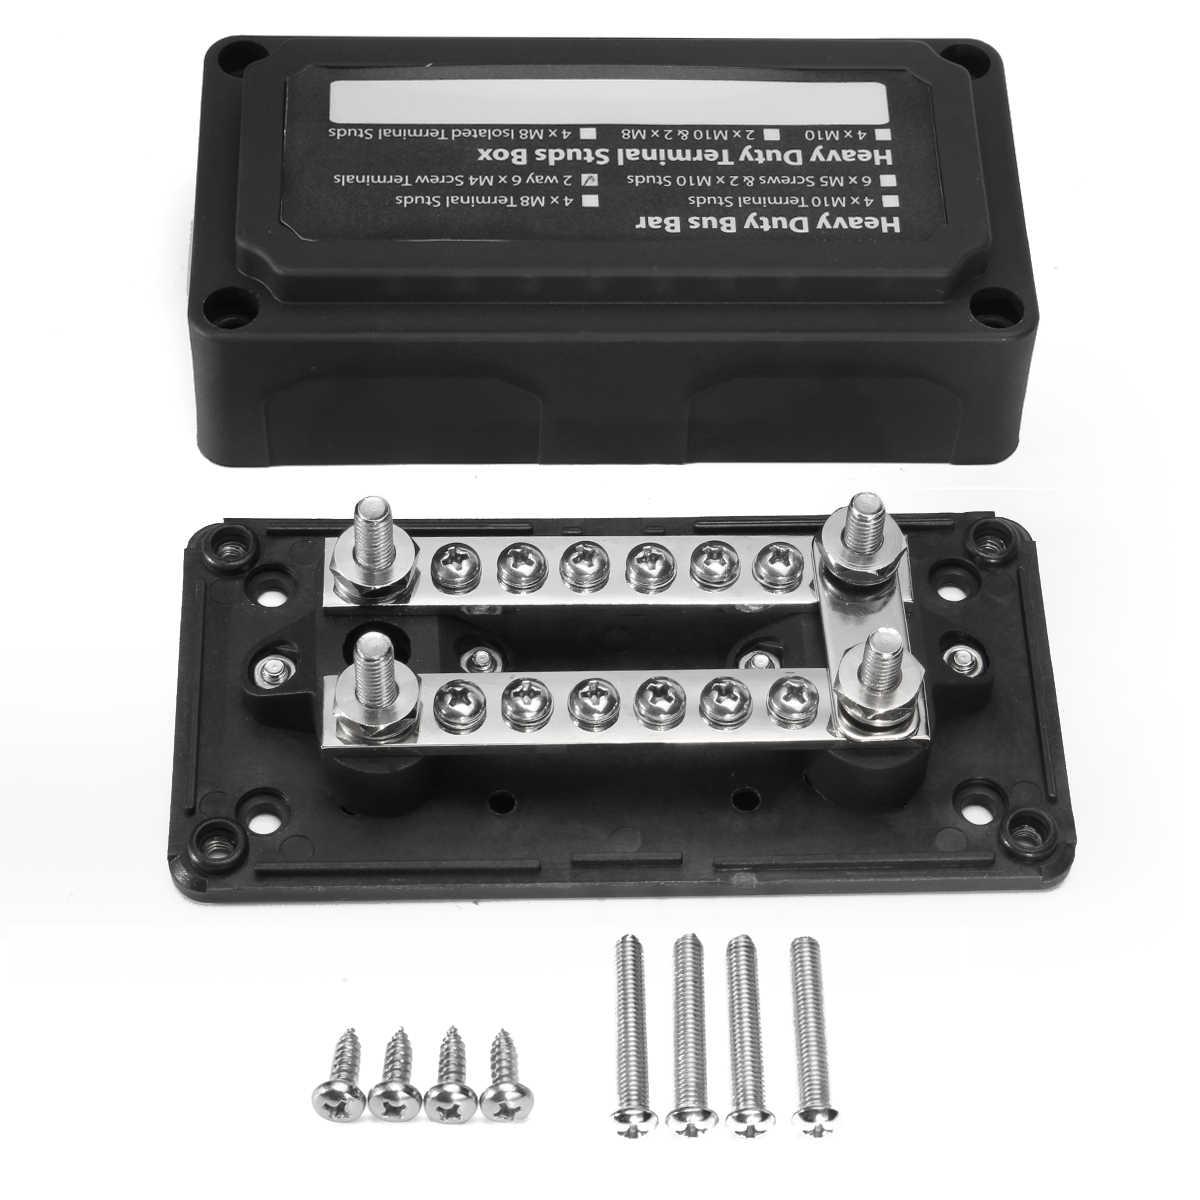 car blade fuse box block 48v heavy-duty modular design dual bus bars with  connecting